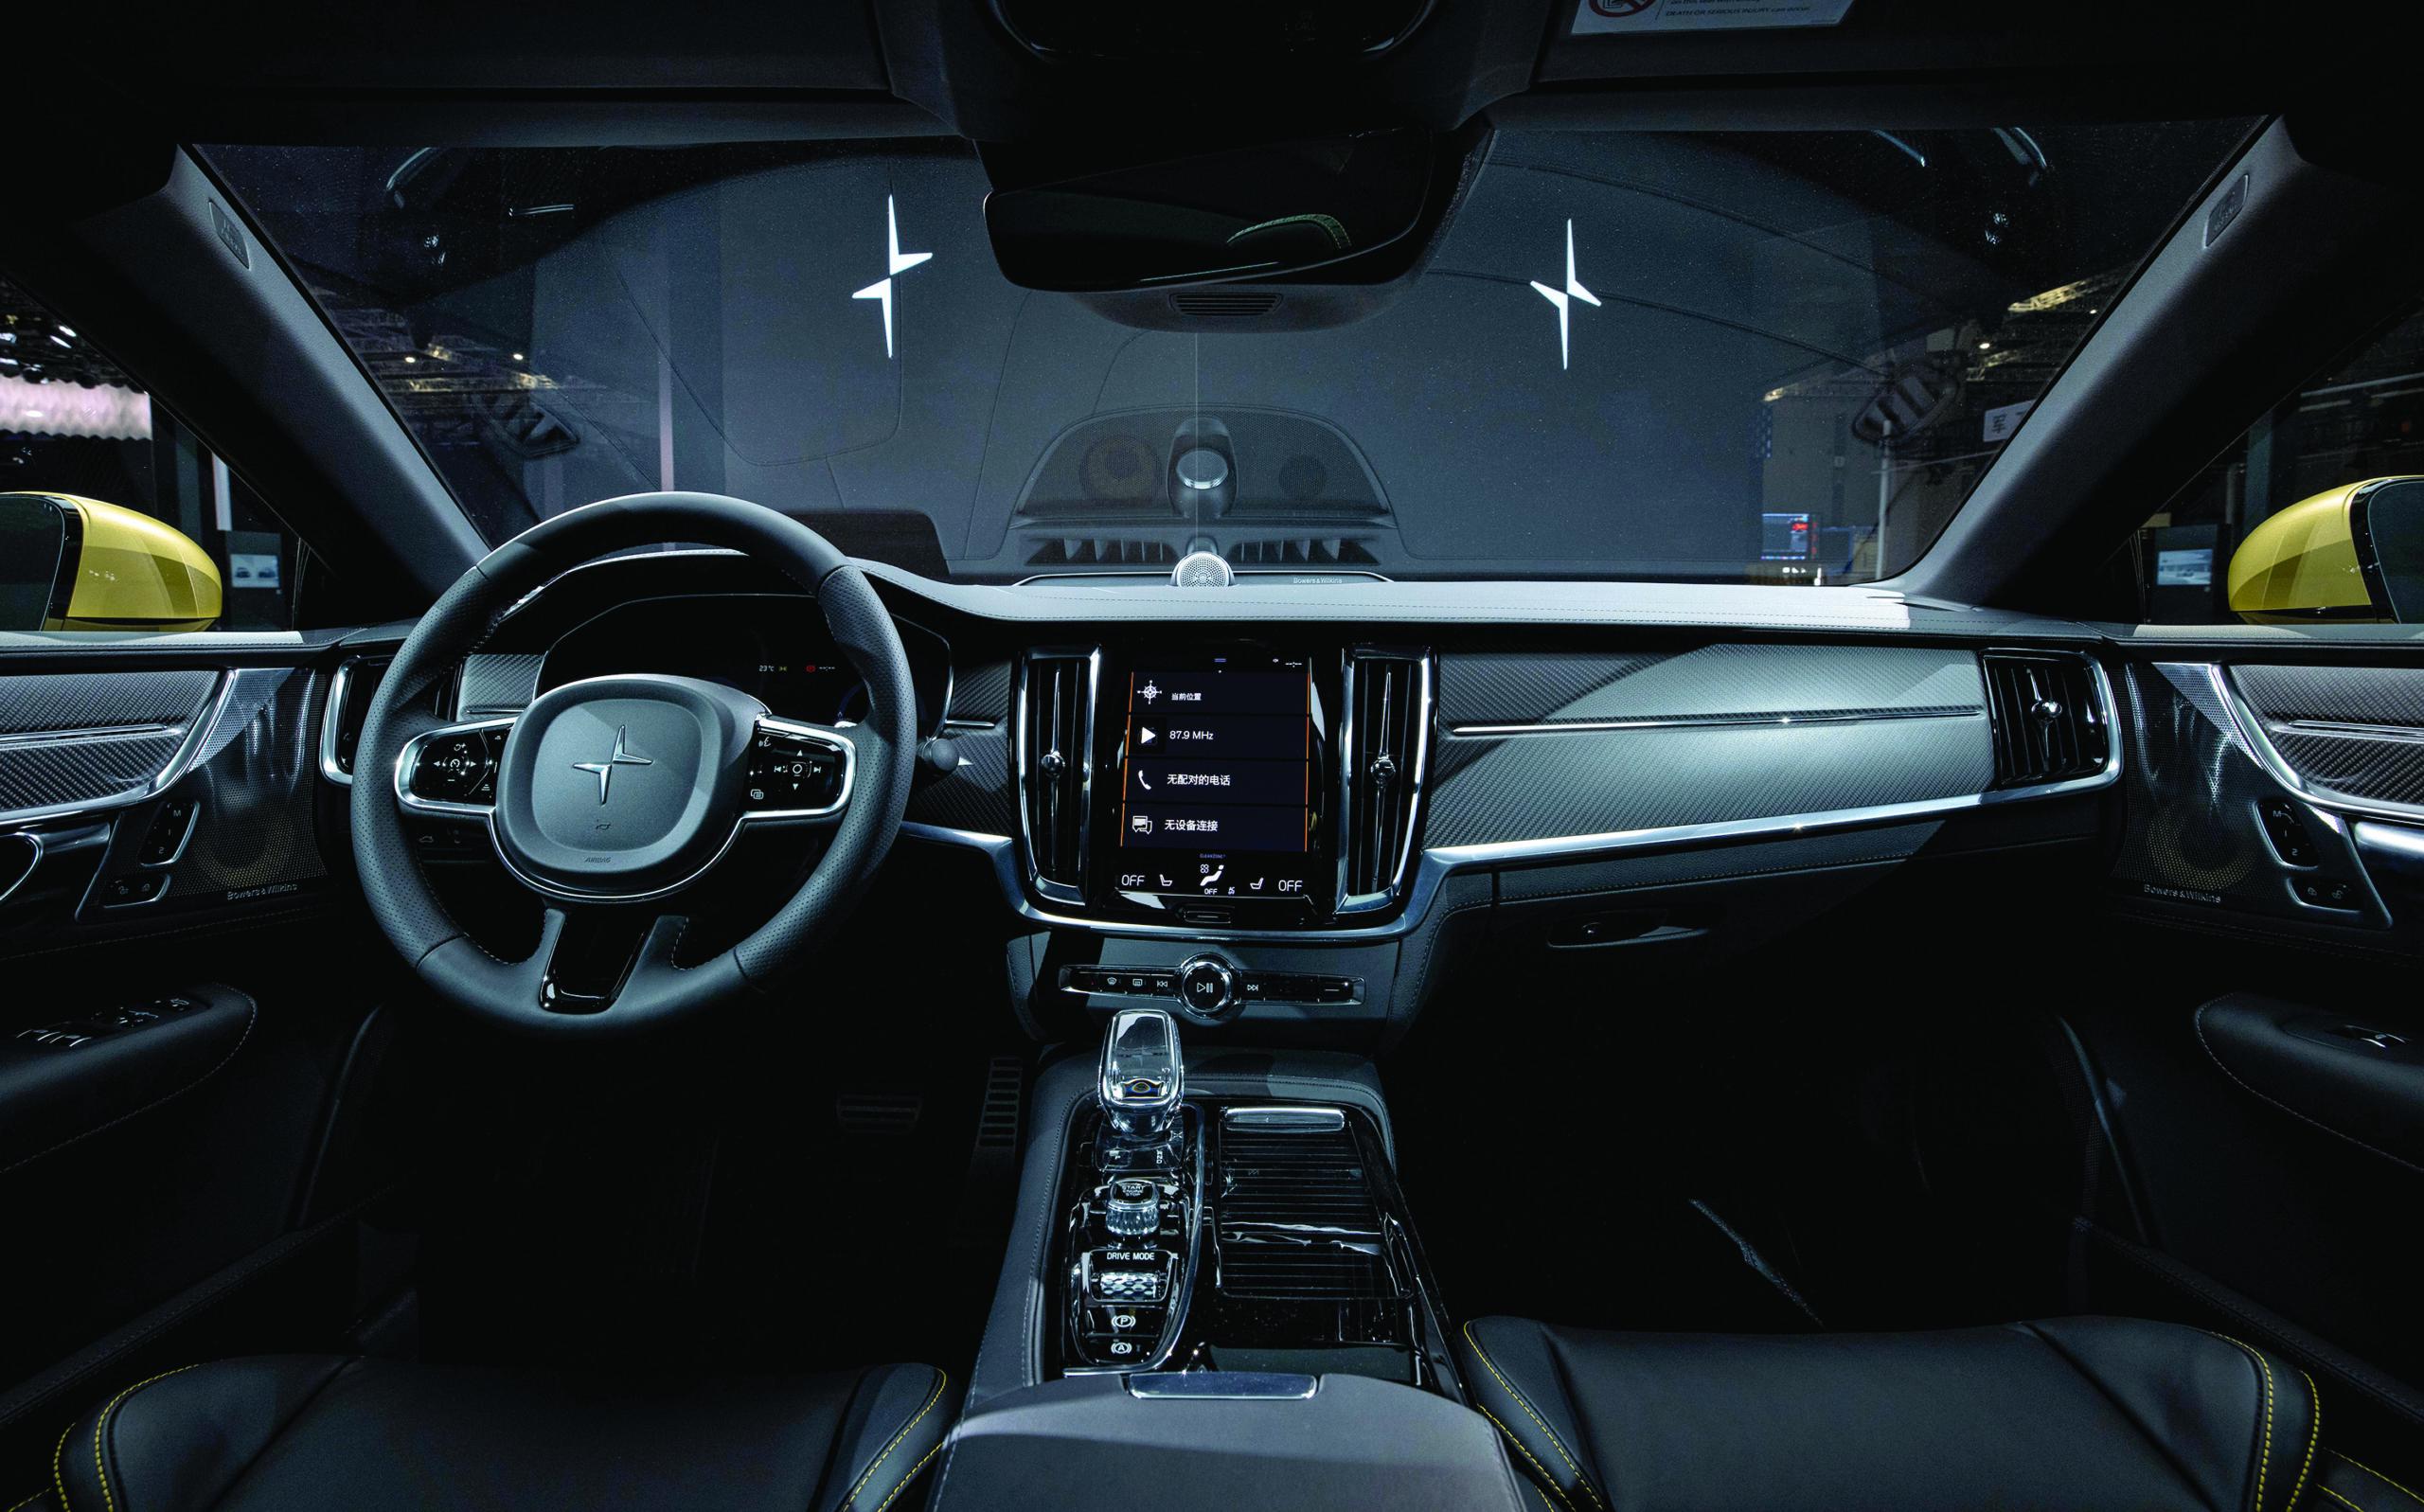 Polestar 1 special edition interior